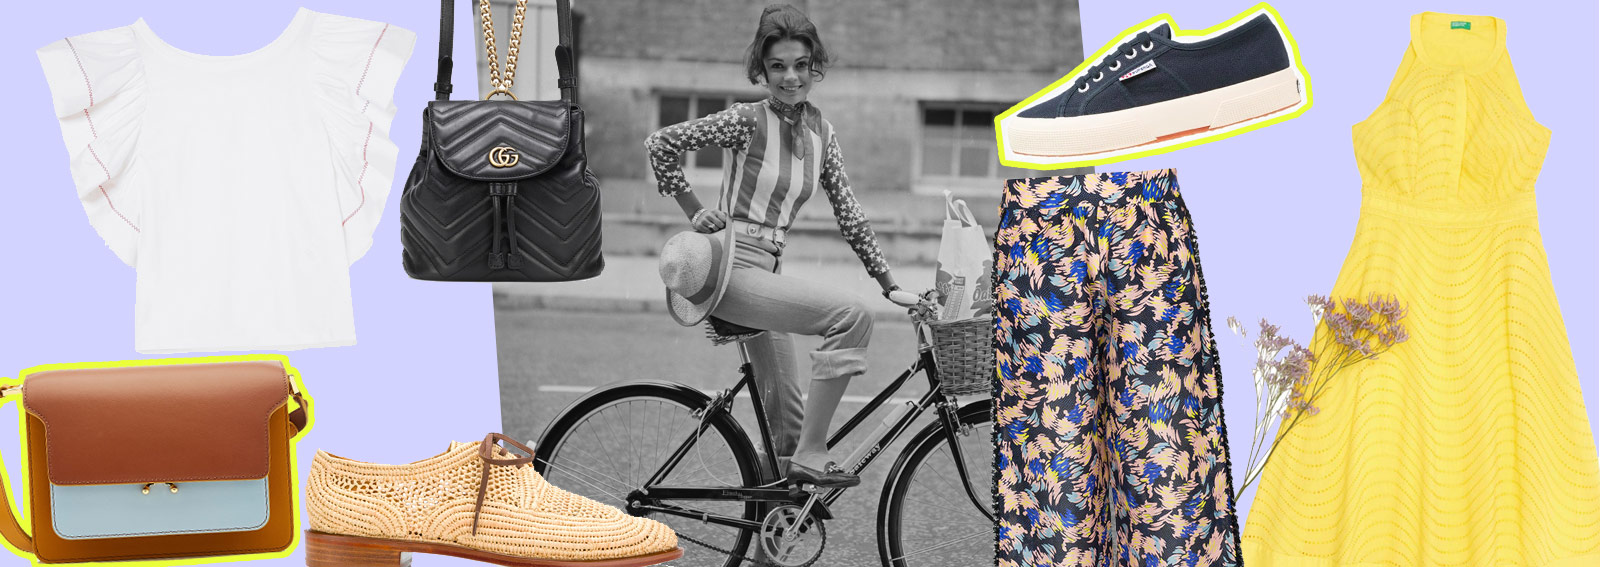 COVER-look-bicicletta-DESKTOP